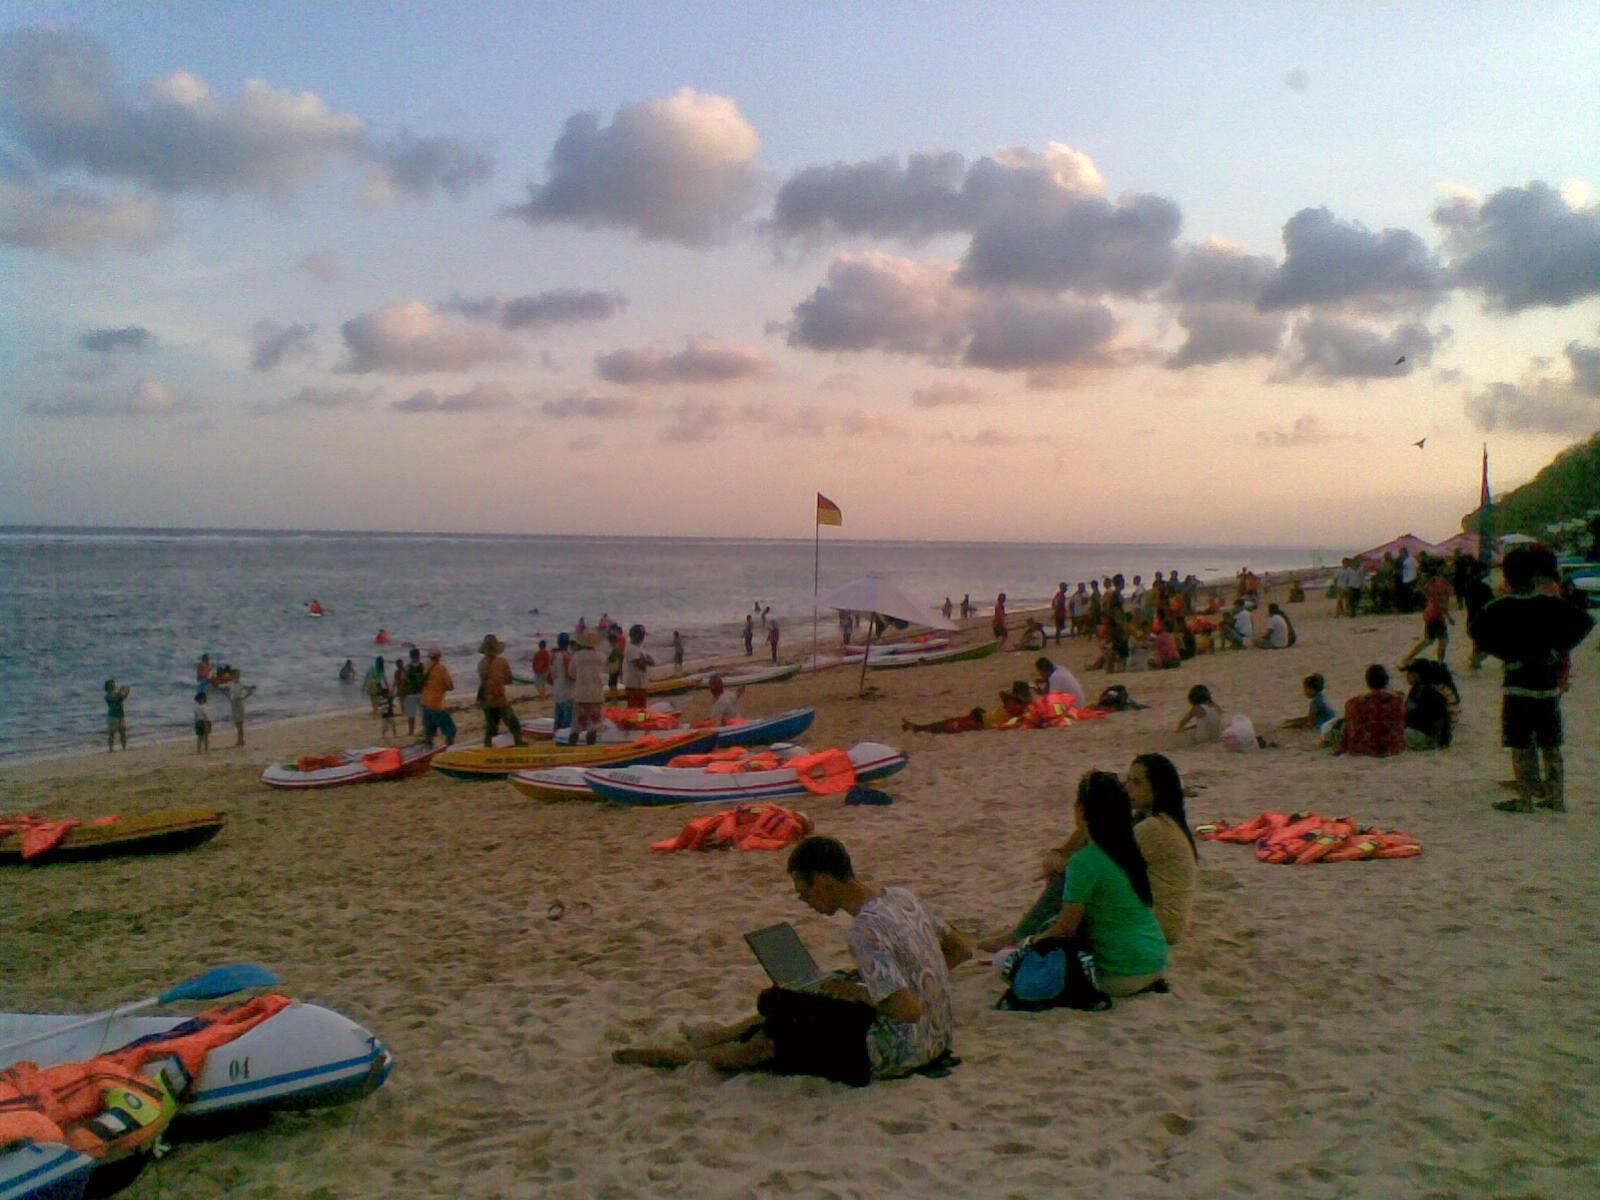 Tempat Wisata Pantai Pandawa Bali